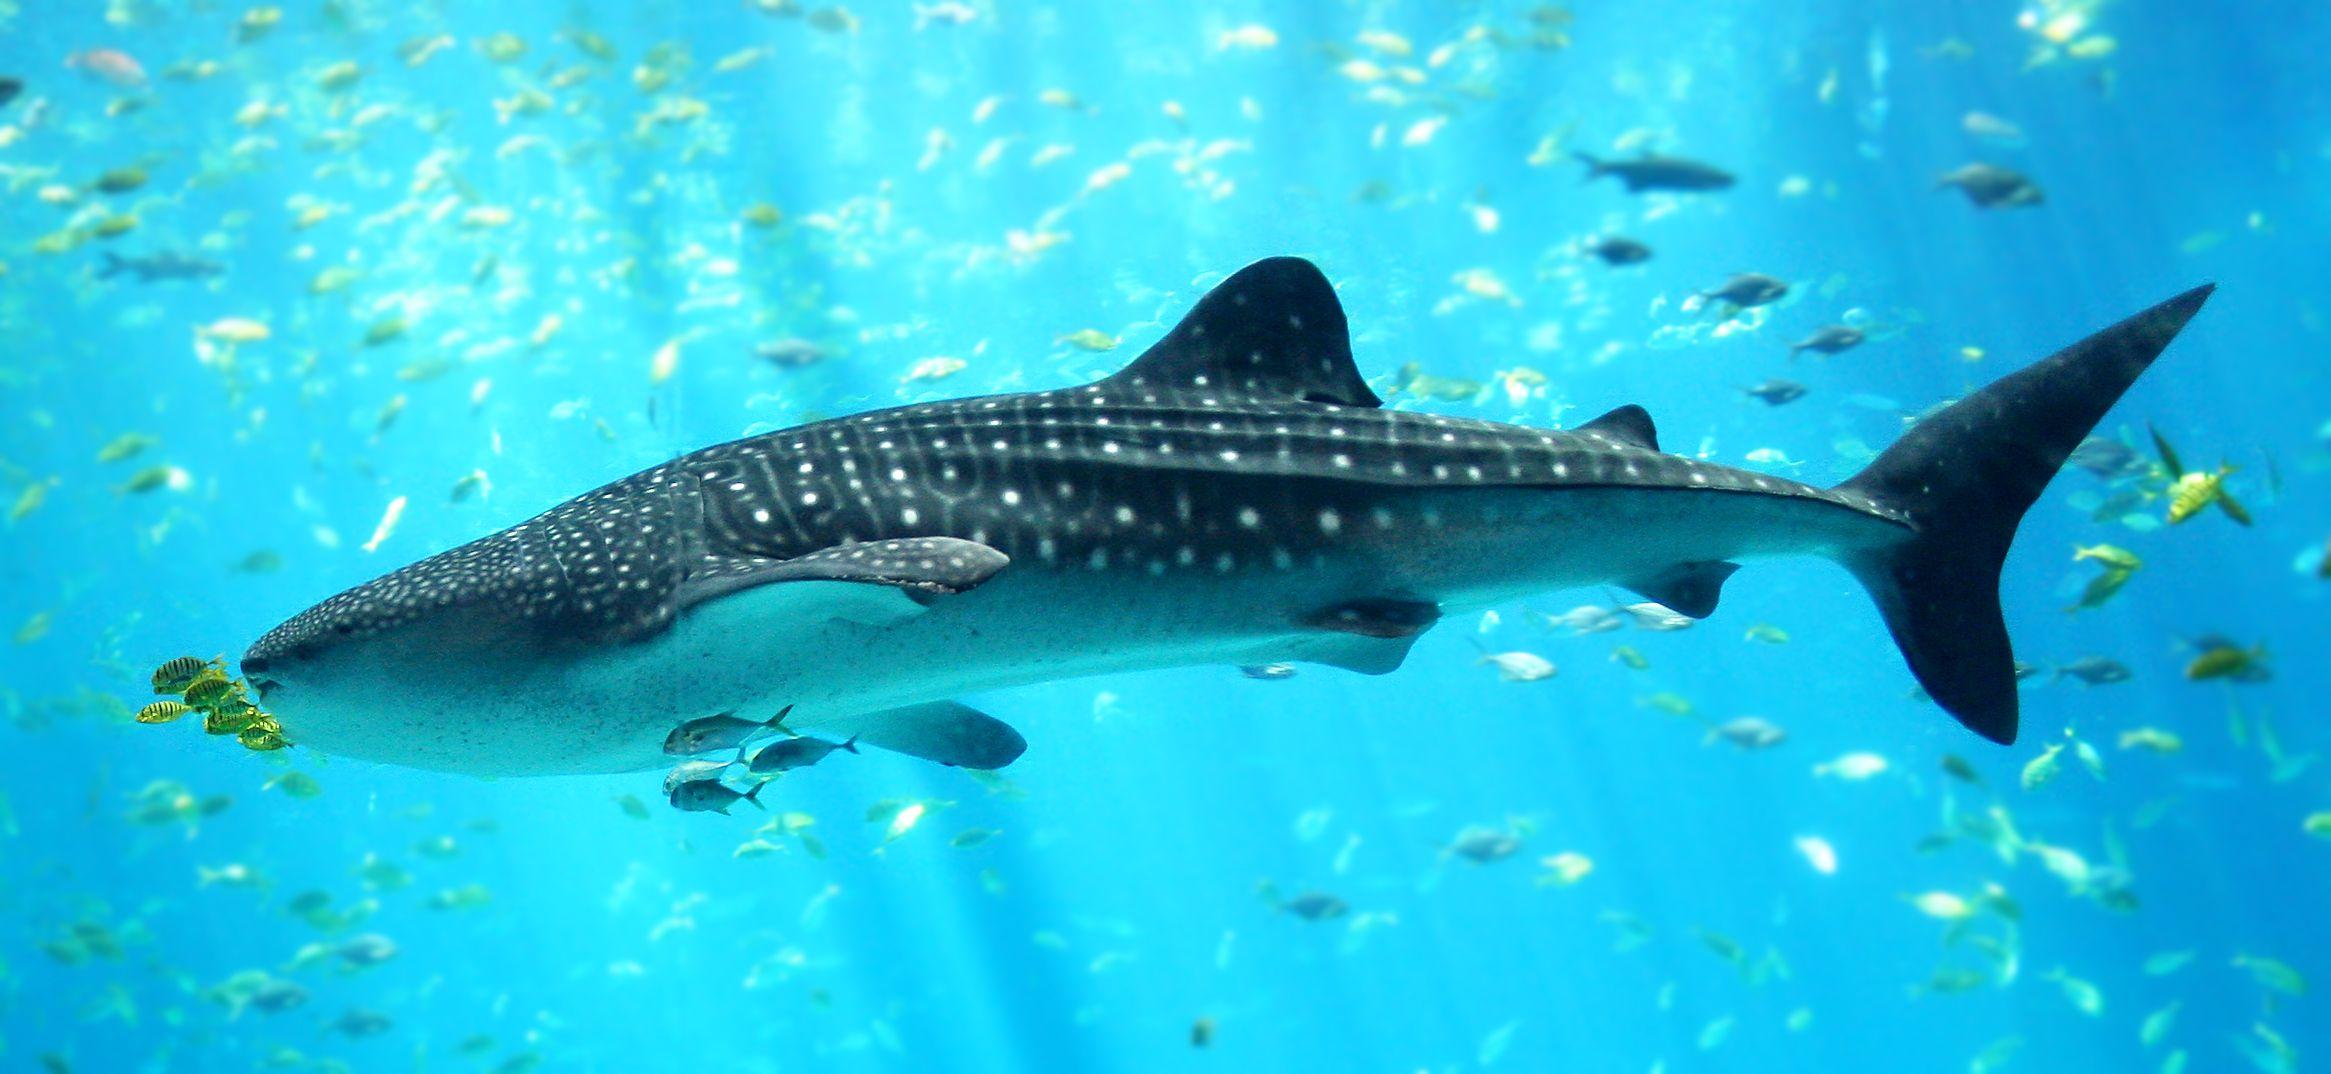 tiburón ballena wallpaper - Buscar con Google   Tiburones ...